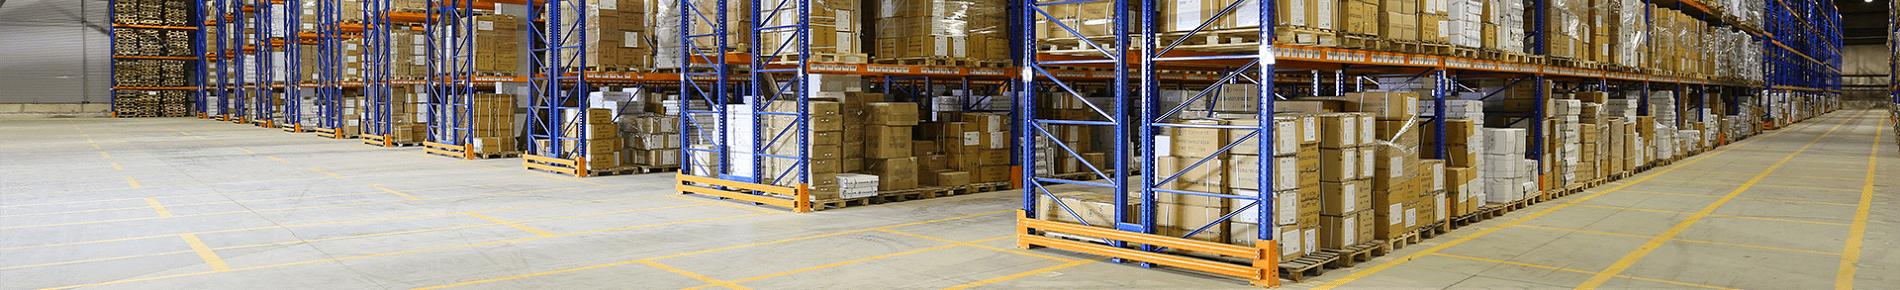 Temporary_storage_warehouse